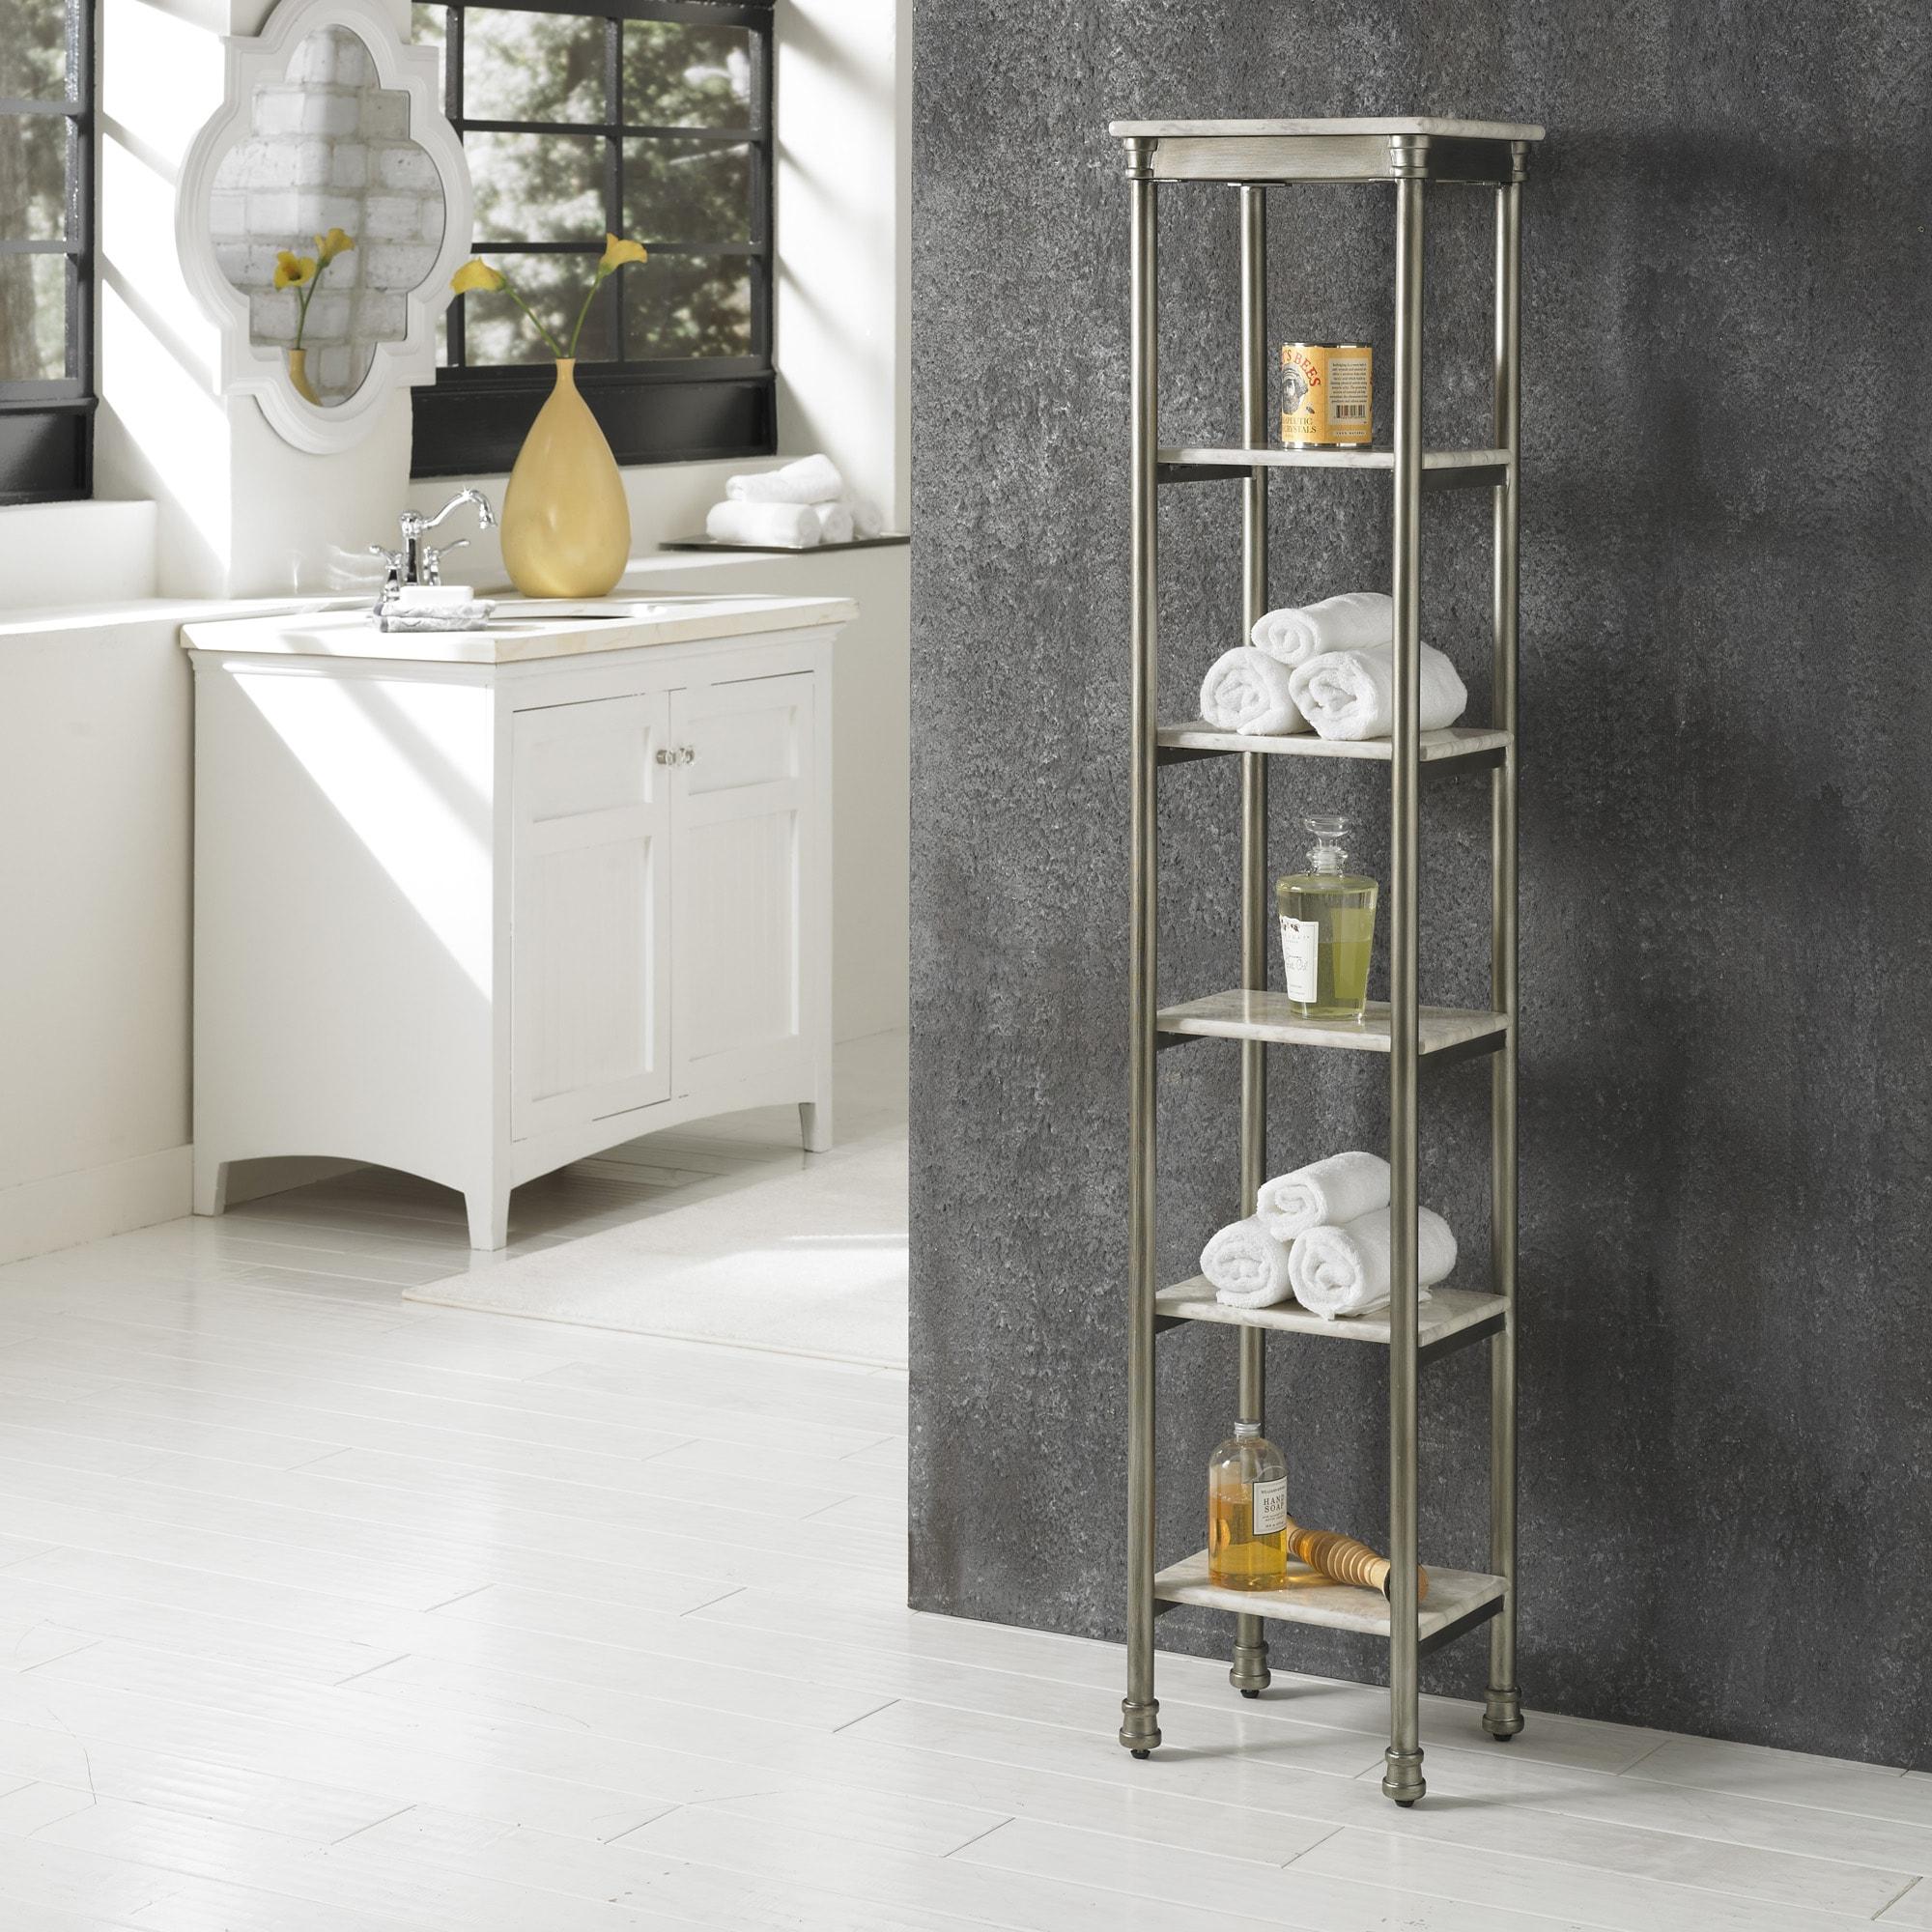 Bathroom Storage Tower 6-Tier Organizer Marble Shelves Metal Feet ...